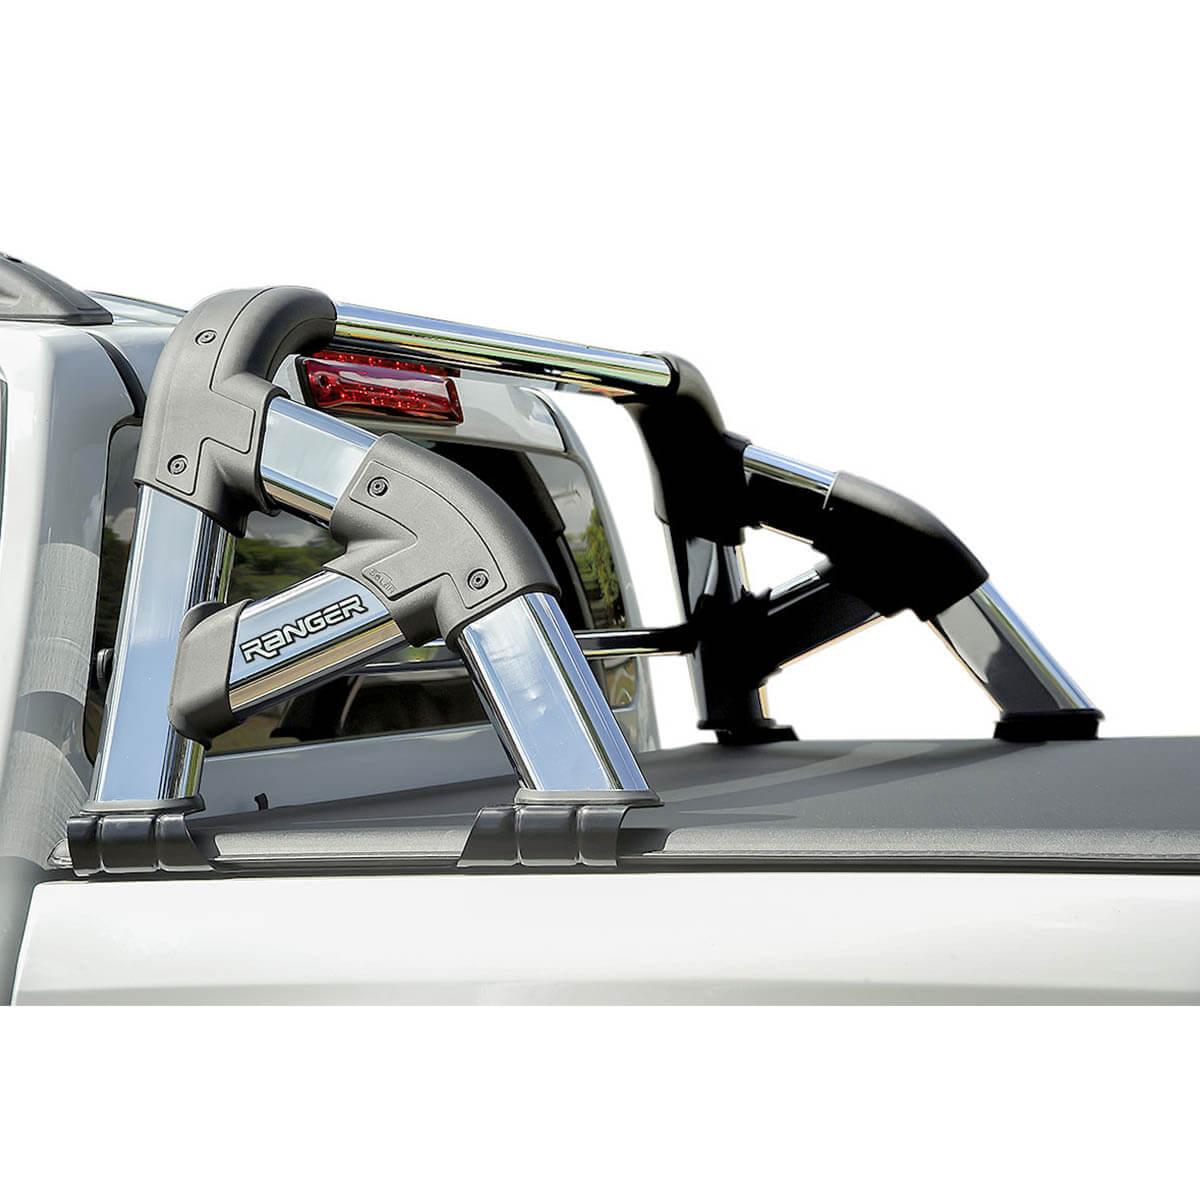 Santo antônio cromado Solar Exclusive Ranger 1994 a 2012 com barra de vidro